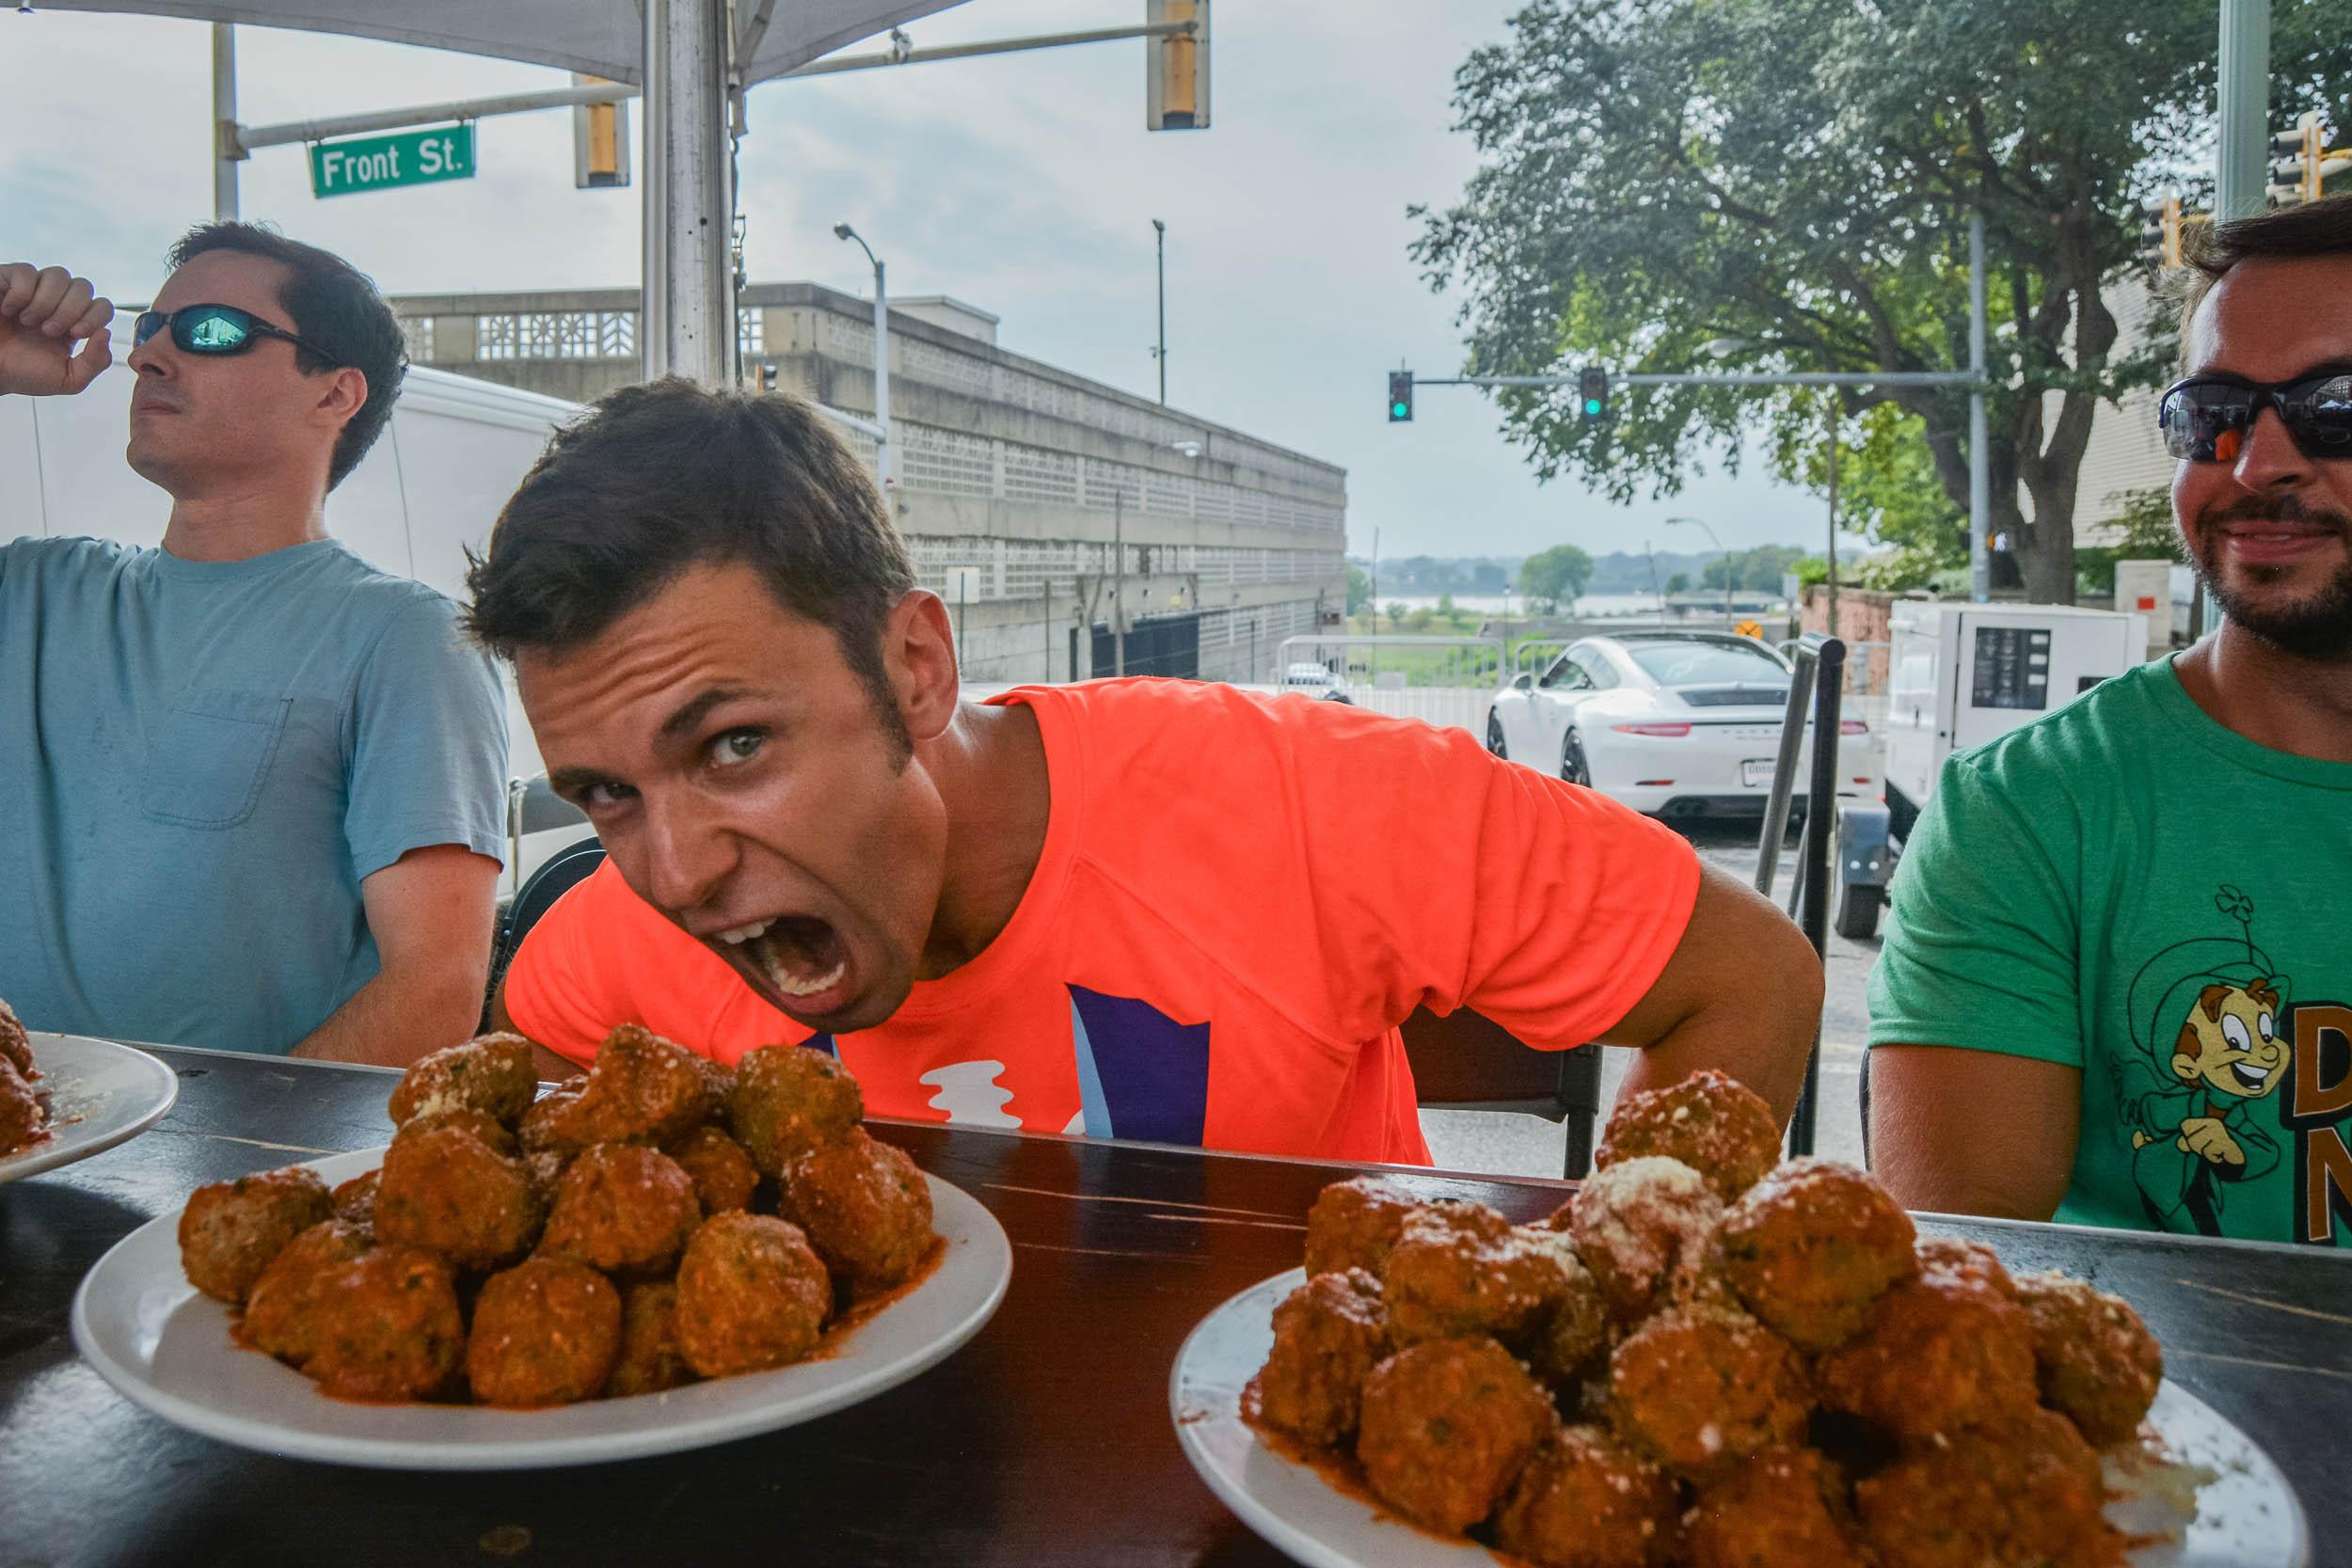 Monroe Avenue Festival Grandmas Meatball Eating Contest0006.jpg